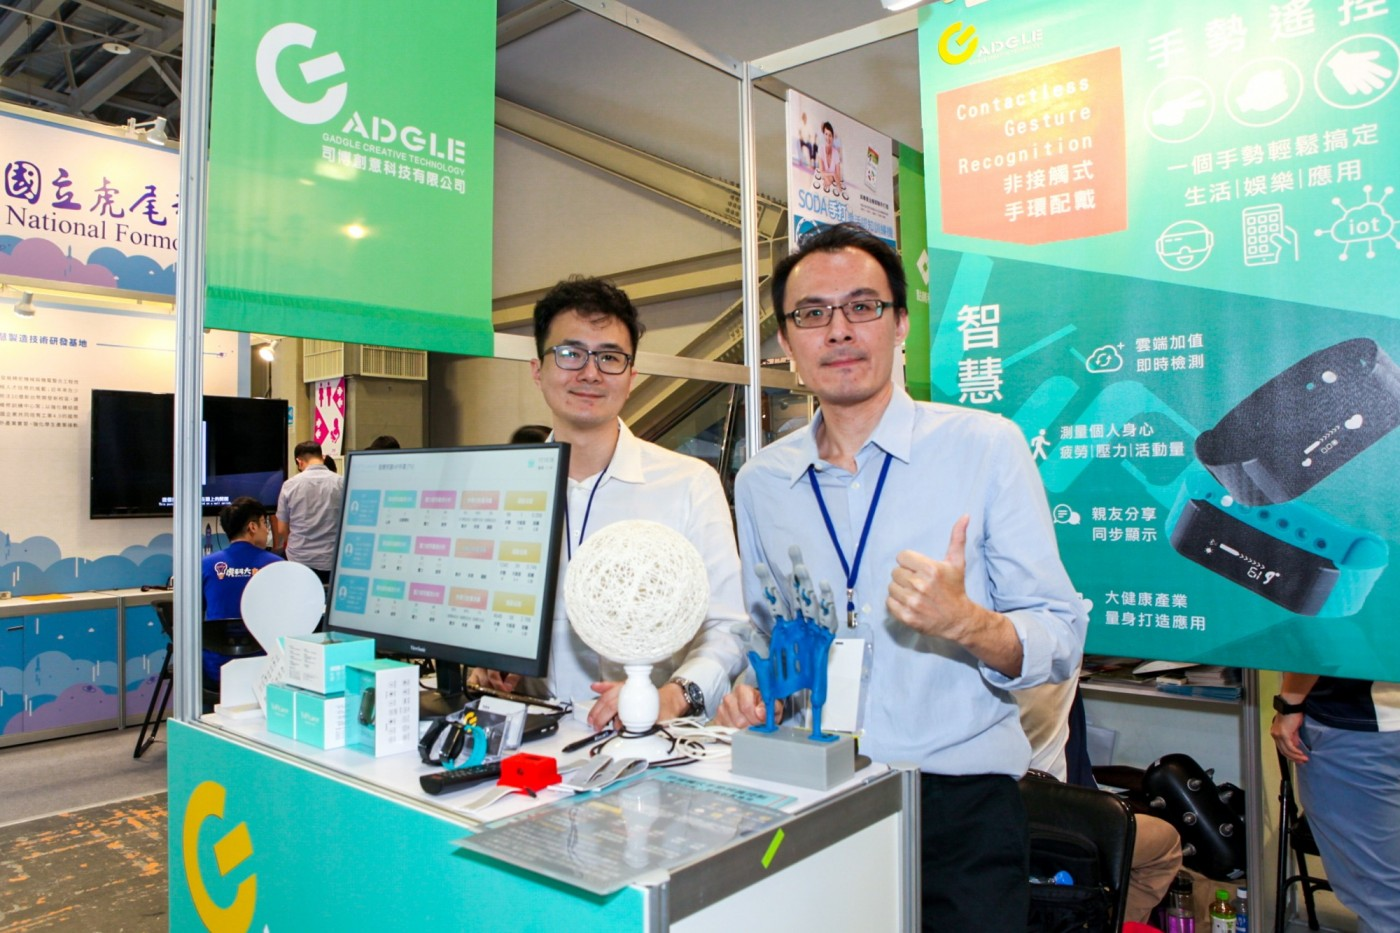 【2018 Meet Taipei】雲端健檢、微型化AI演算法,這些IoT新創在萬物聯網時代力尋機會